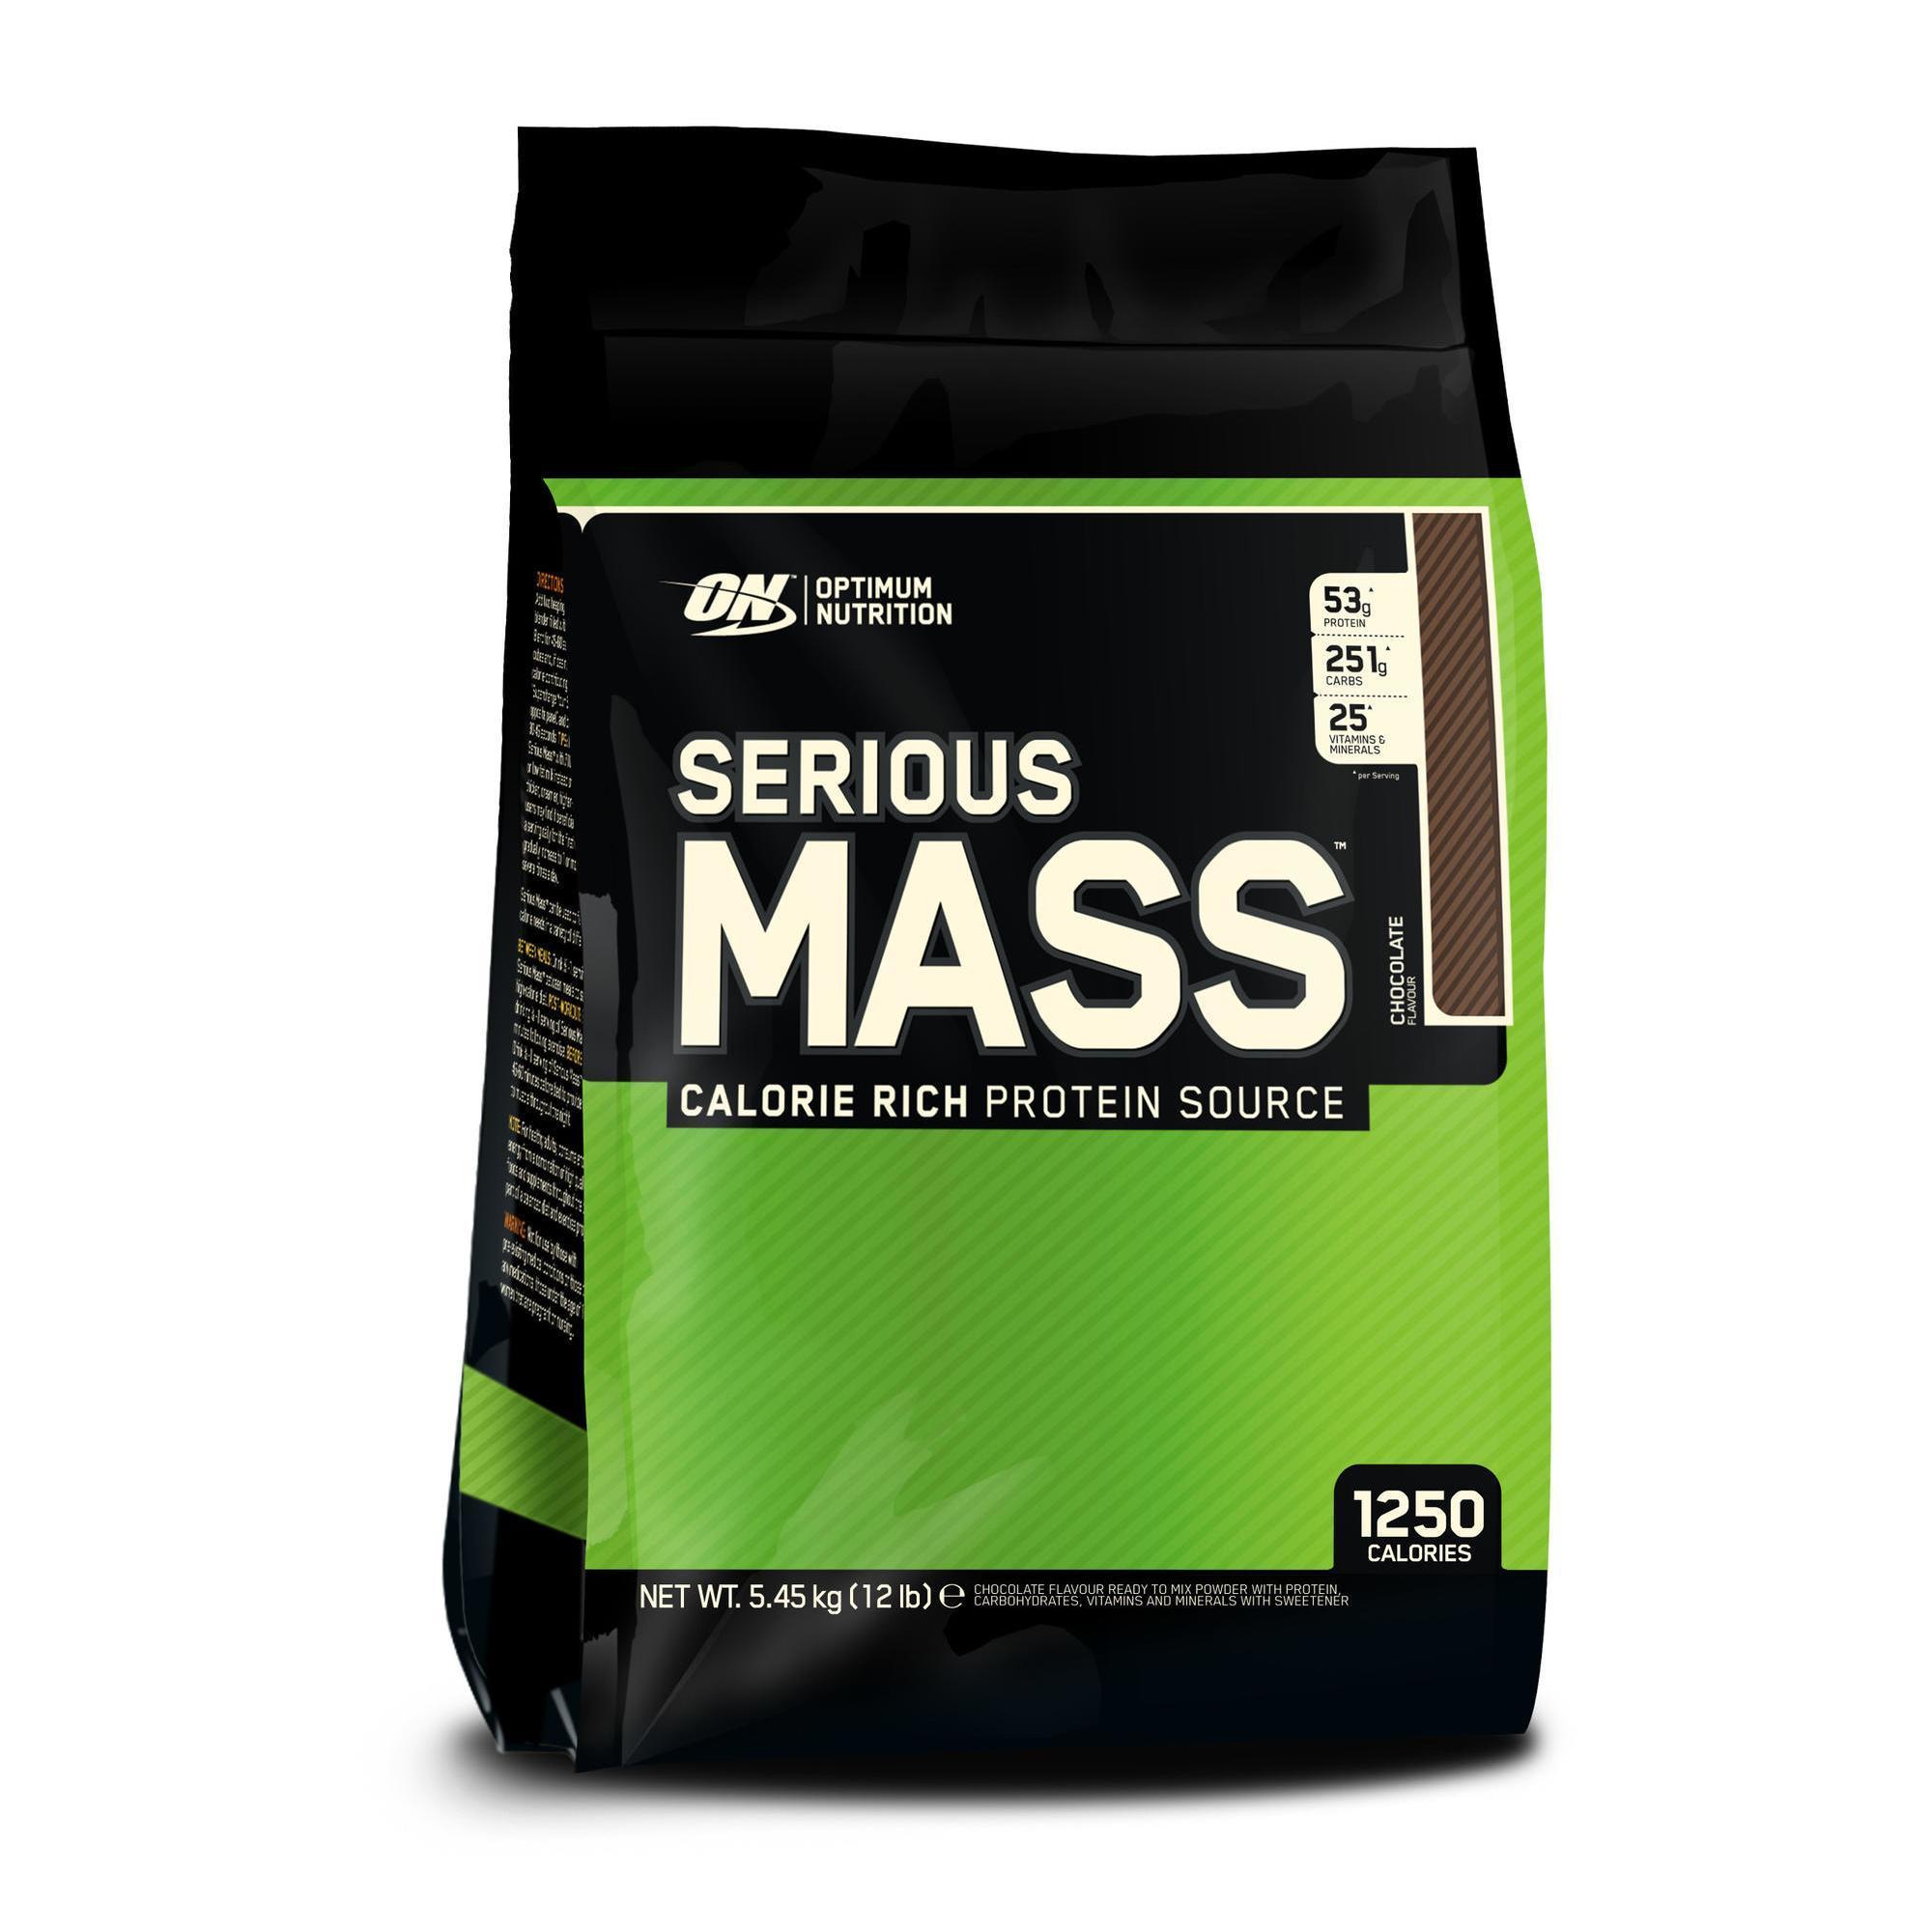 Optimum nutrition em Serious Mass chocolade 5,4 kg kopen